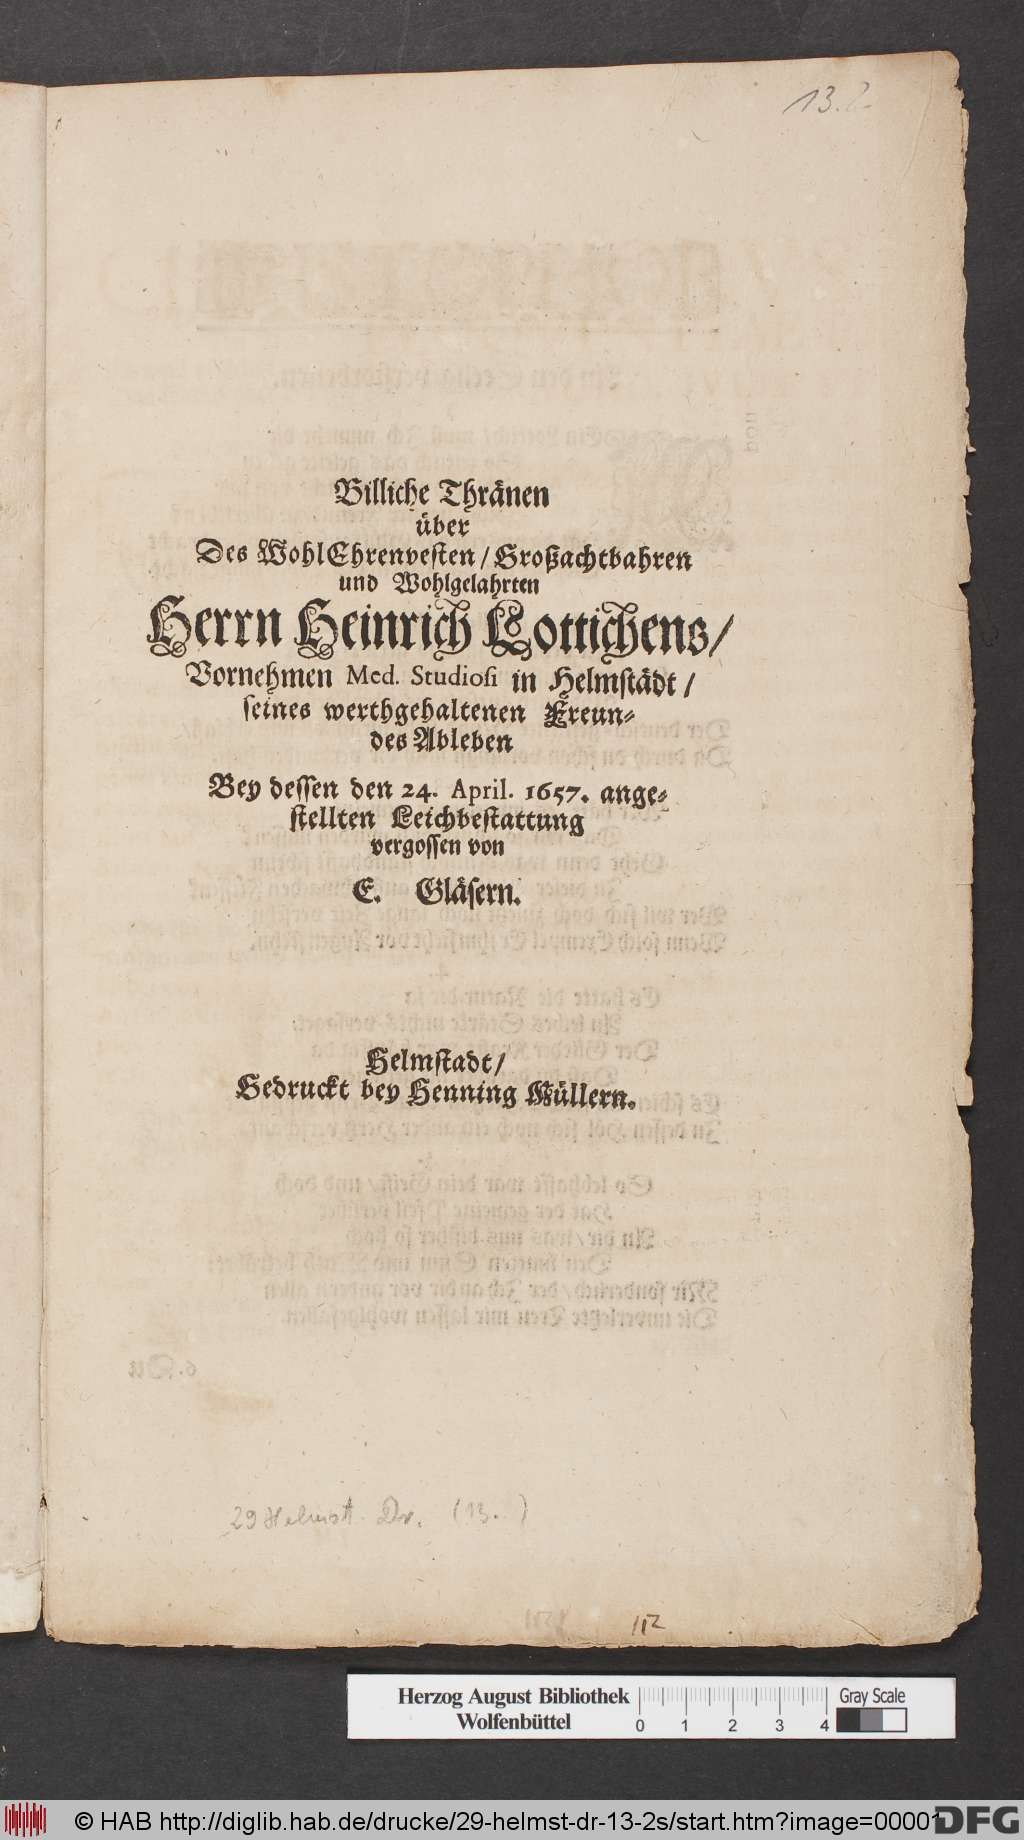 http://diglib.hab.de/drucke/29-helmst-dr-13-2s/00001.jpg